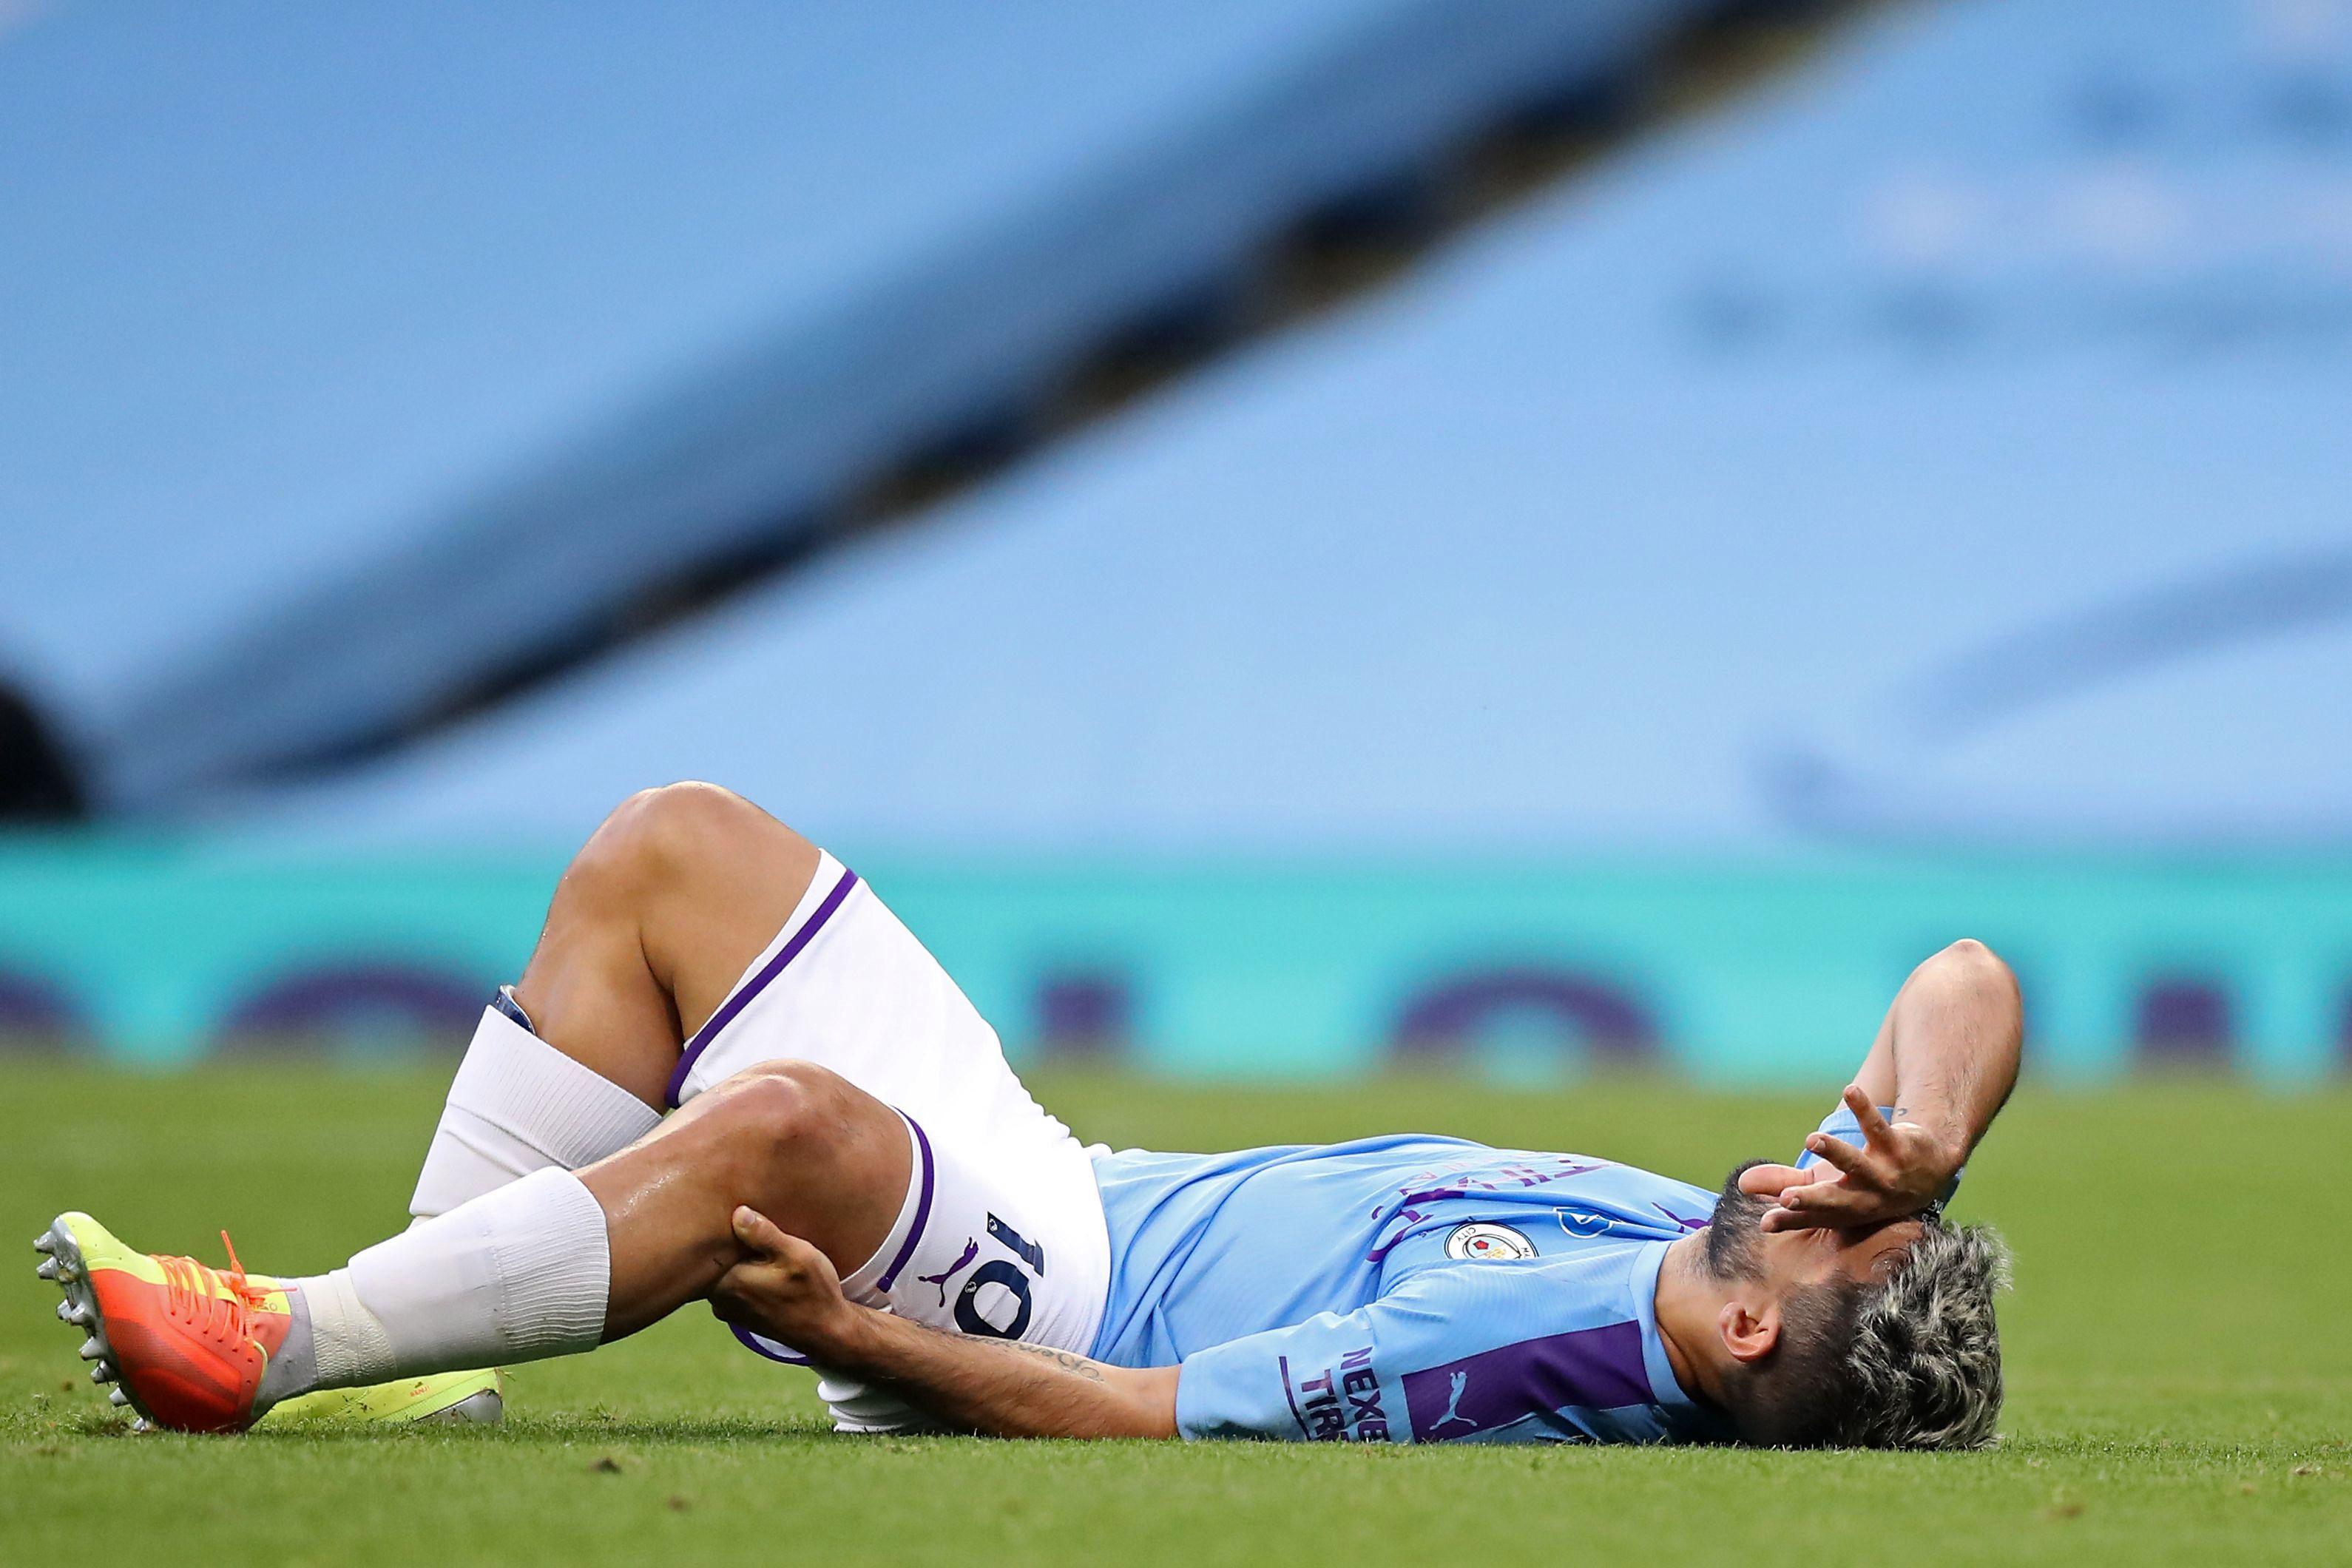 Aguero was injured in a challenge with Burnley's Ben Mee